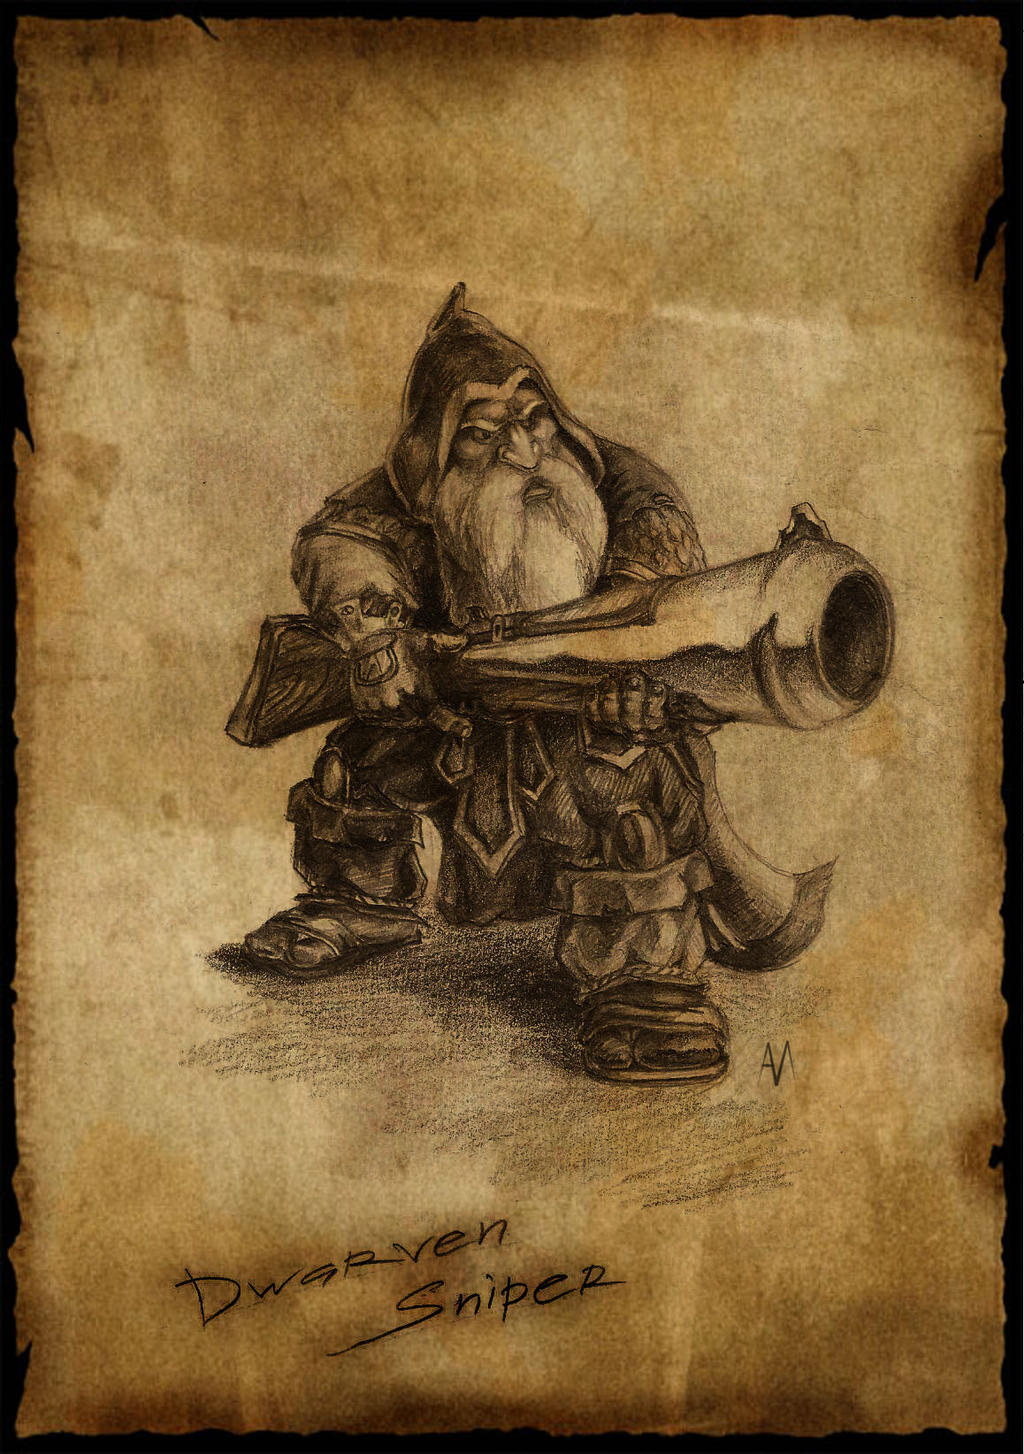 Warcraft dwarf porn story hardcore lovers